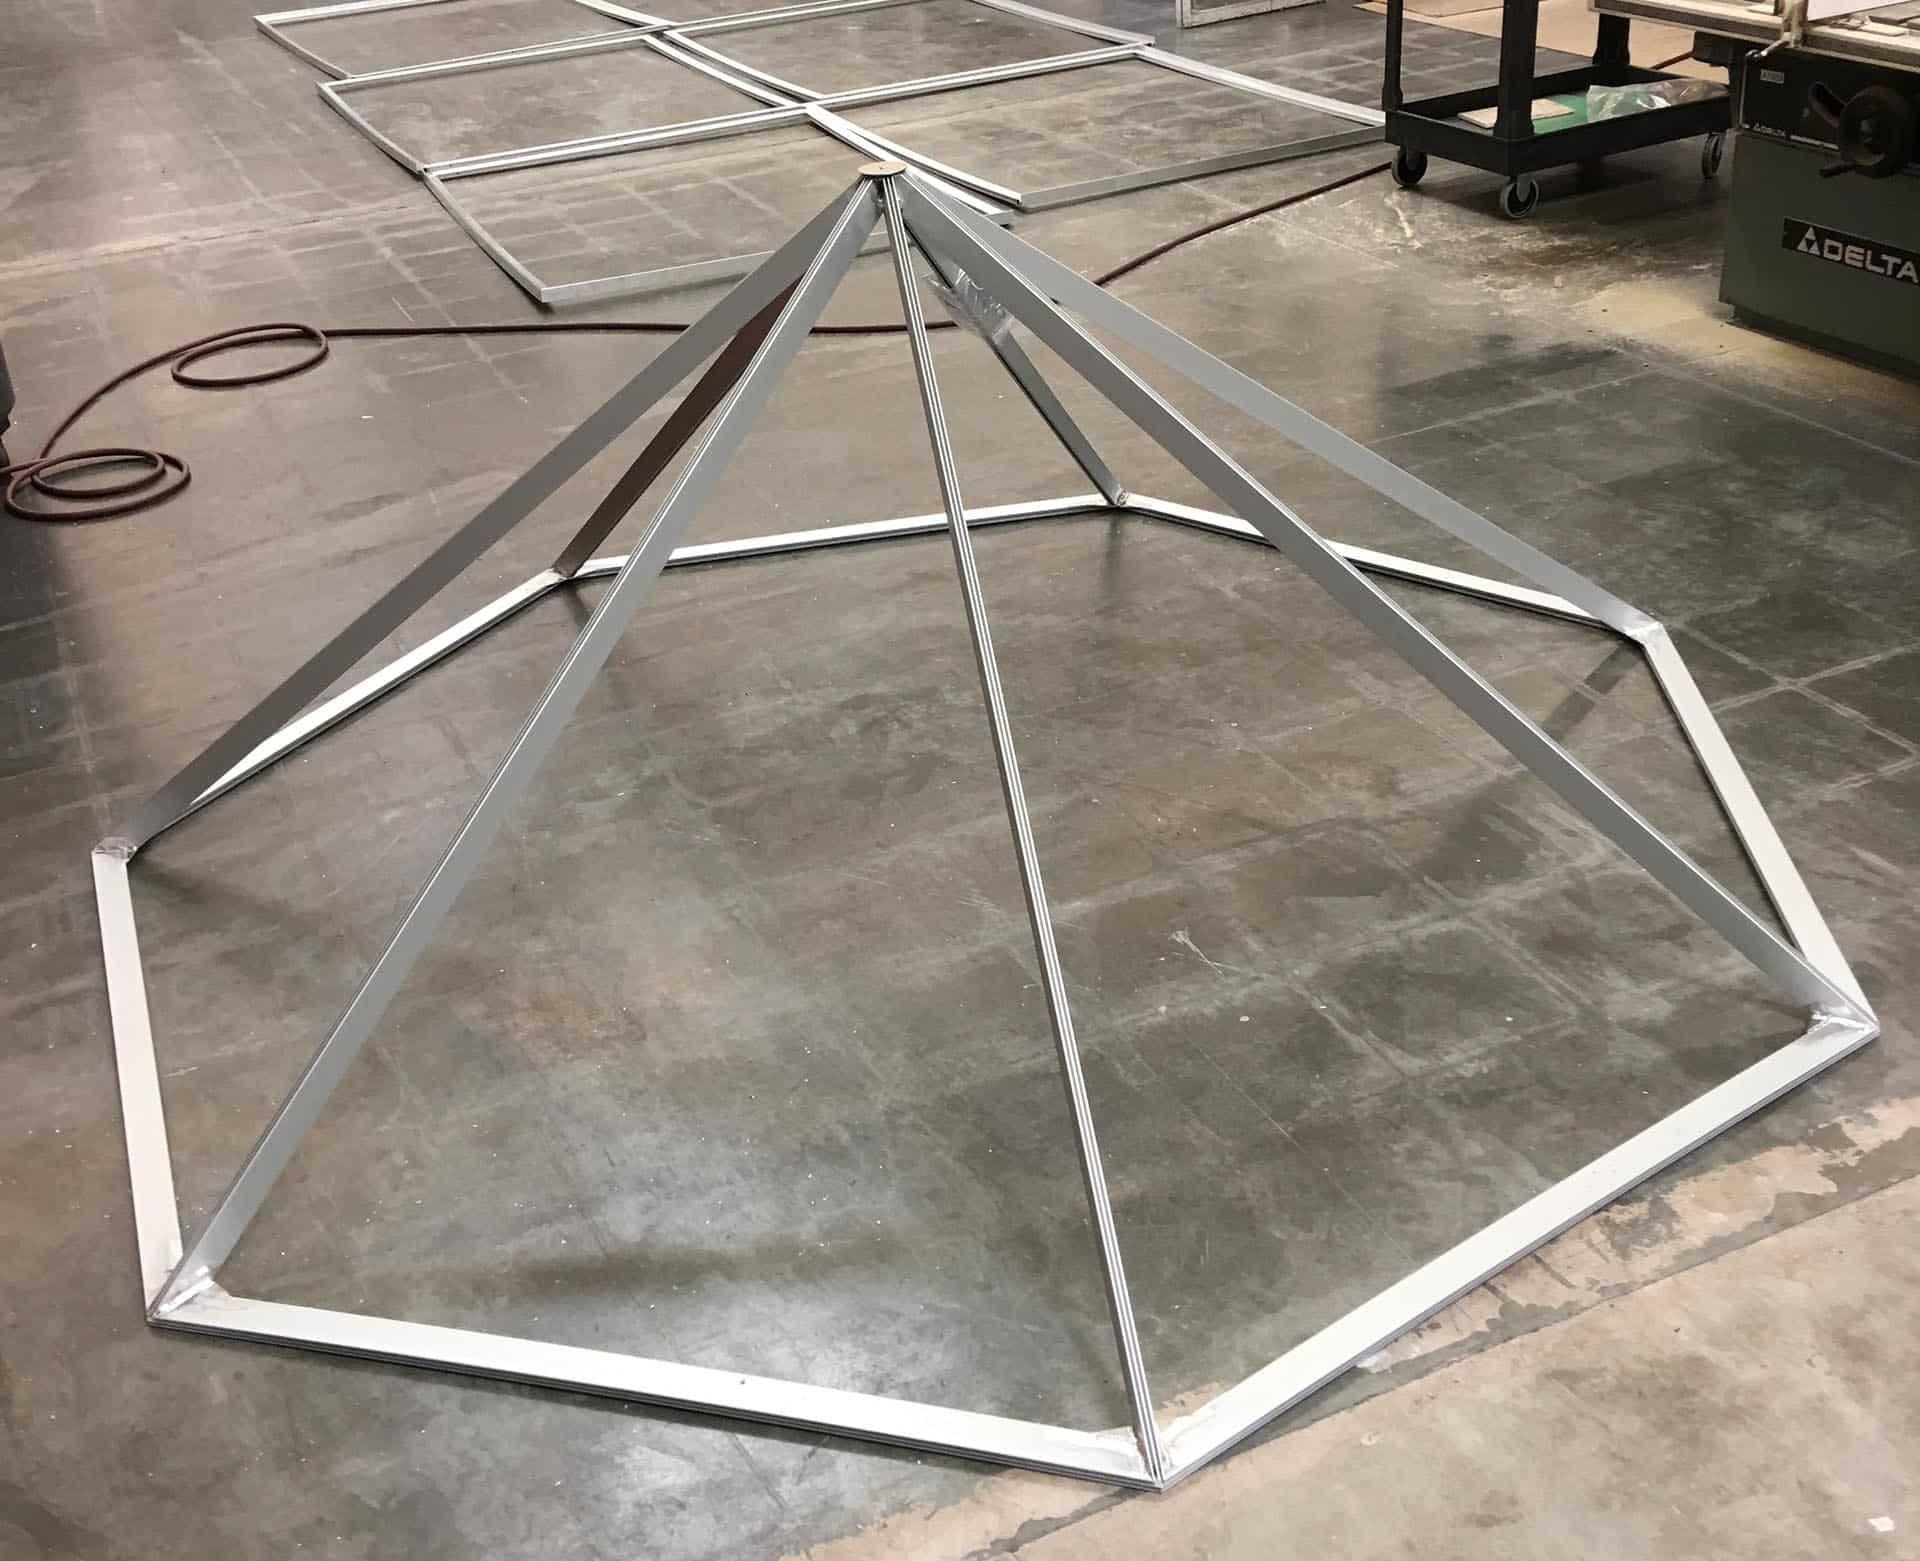 hanging-trade-show-display-frame